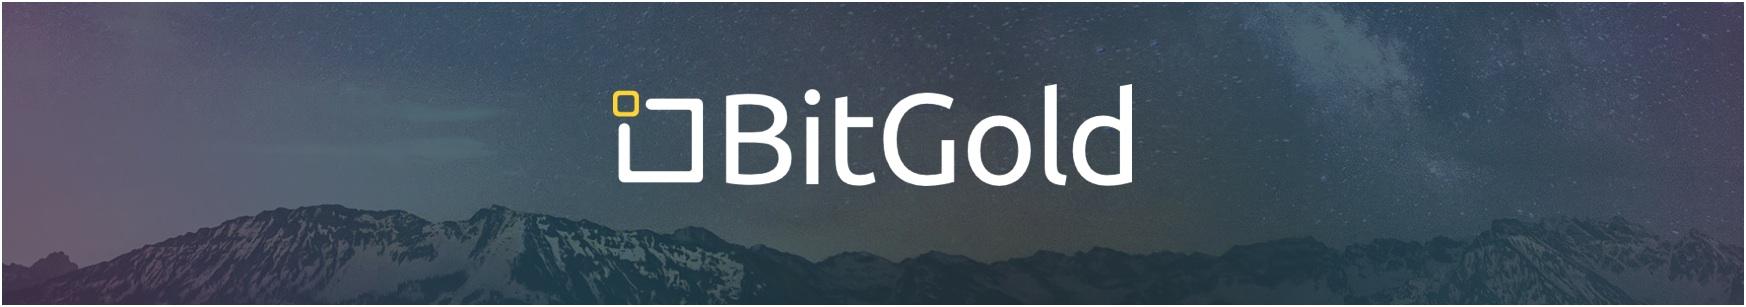 KWN : BitGold - Logo 1.3